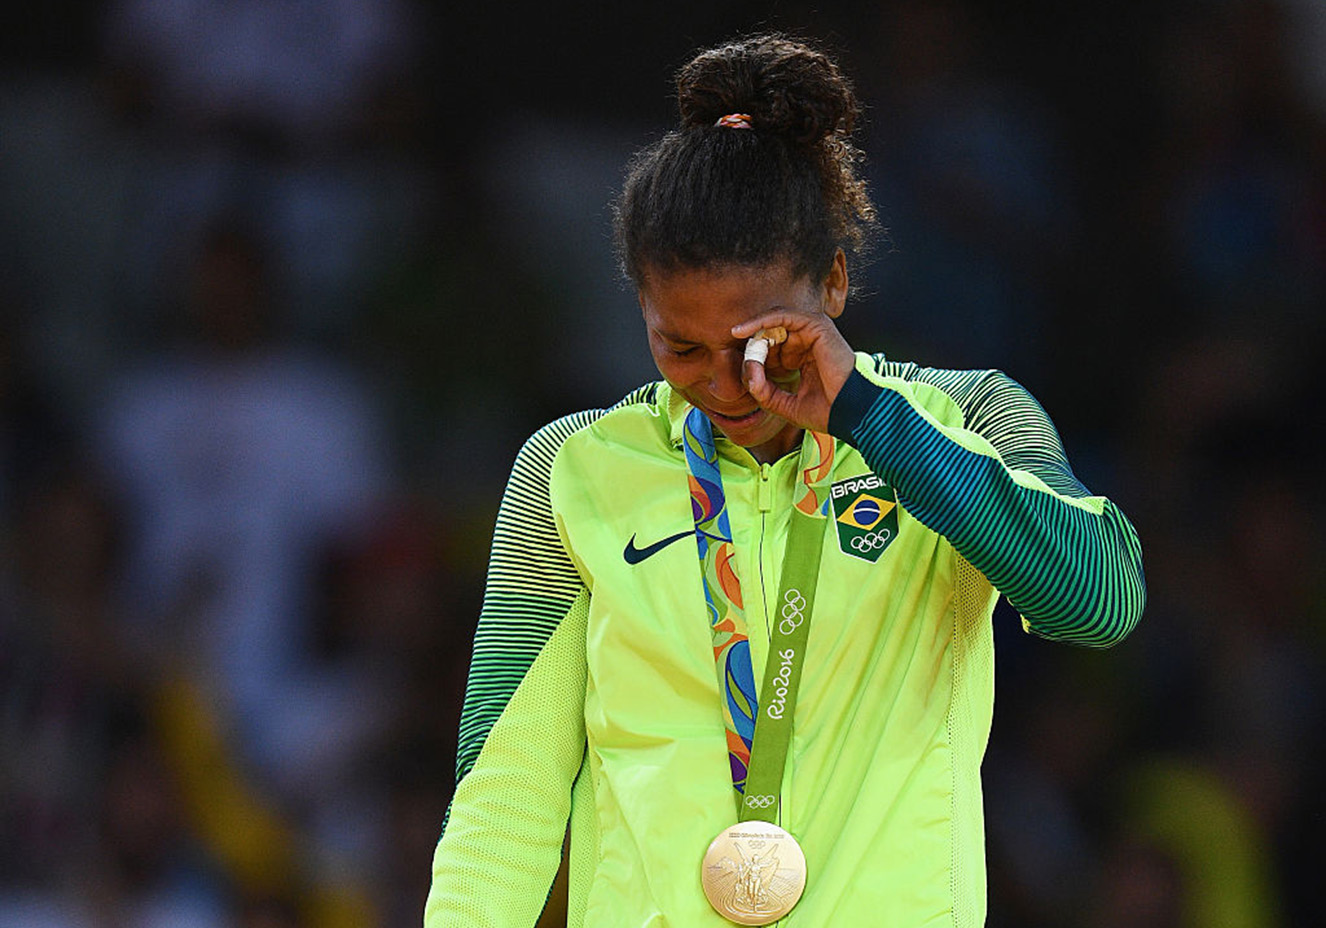 David Ramos/Equipa/Getty Images